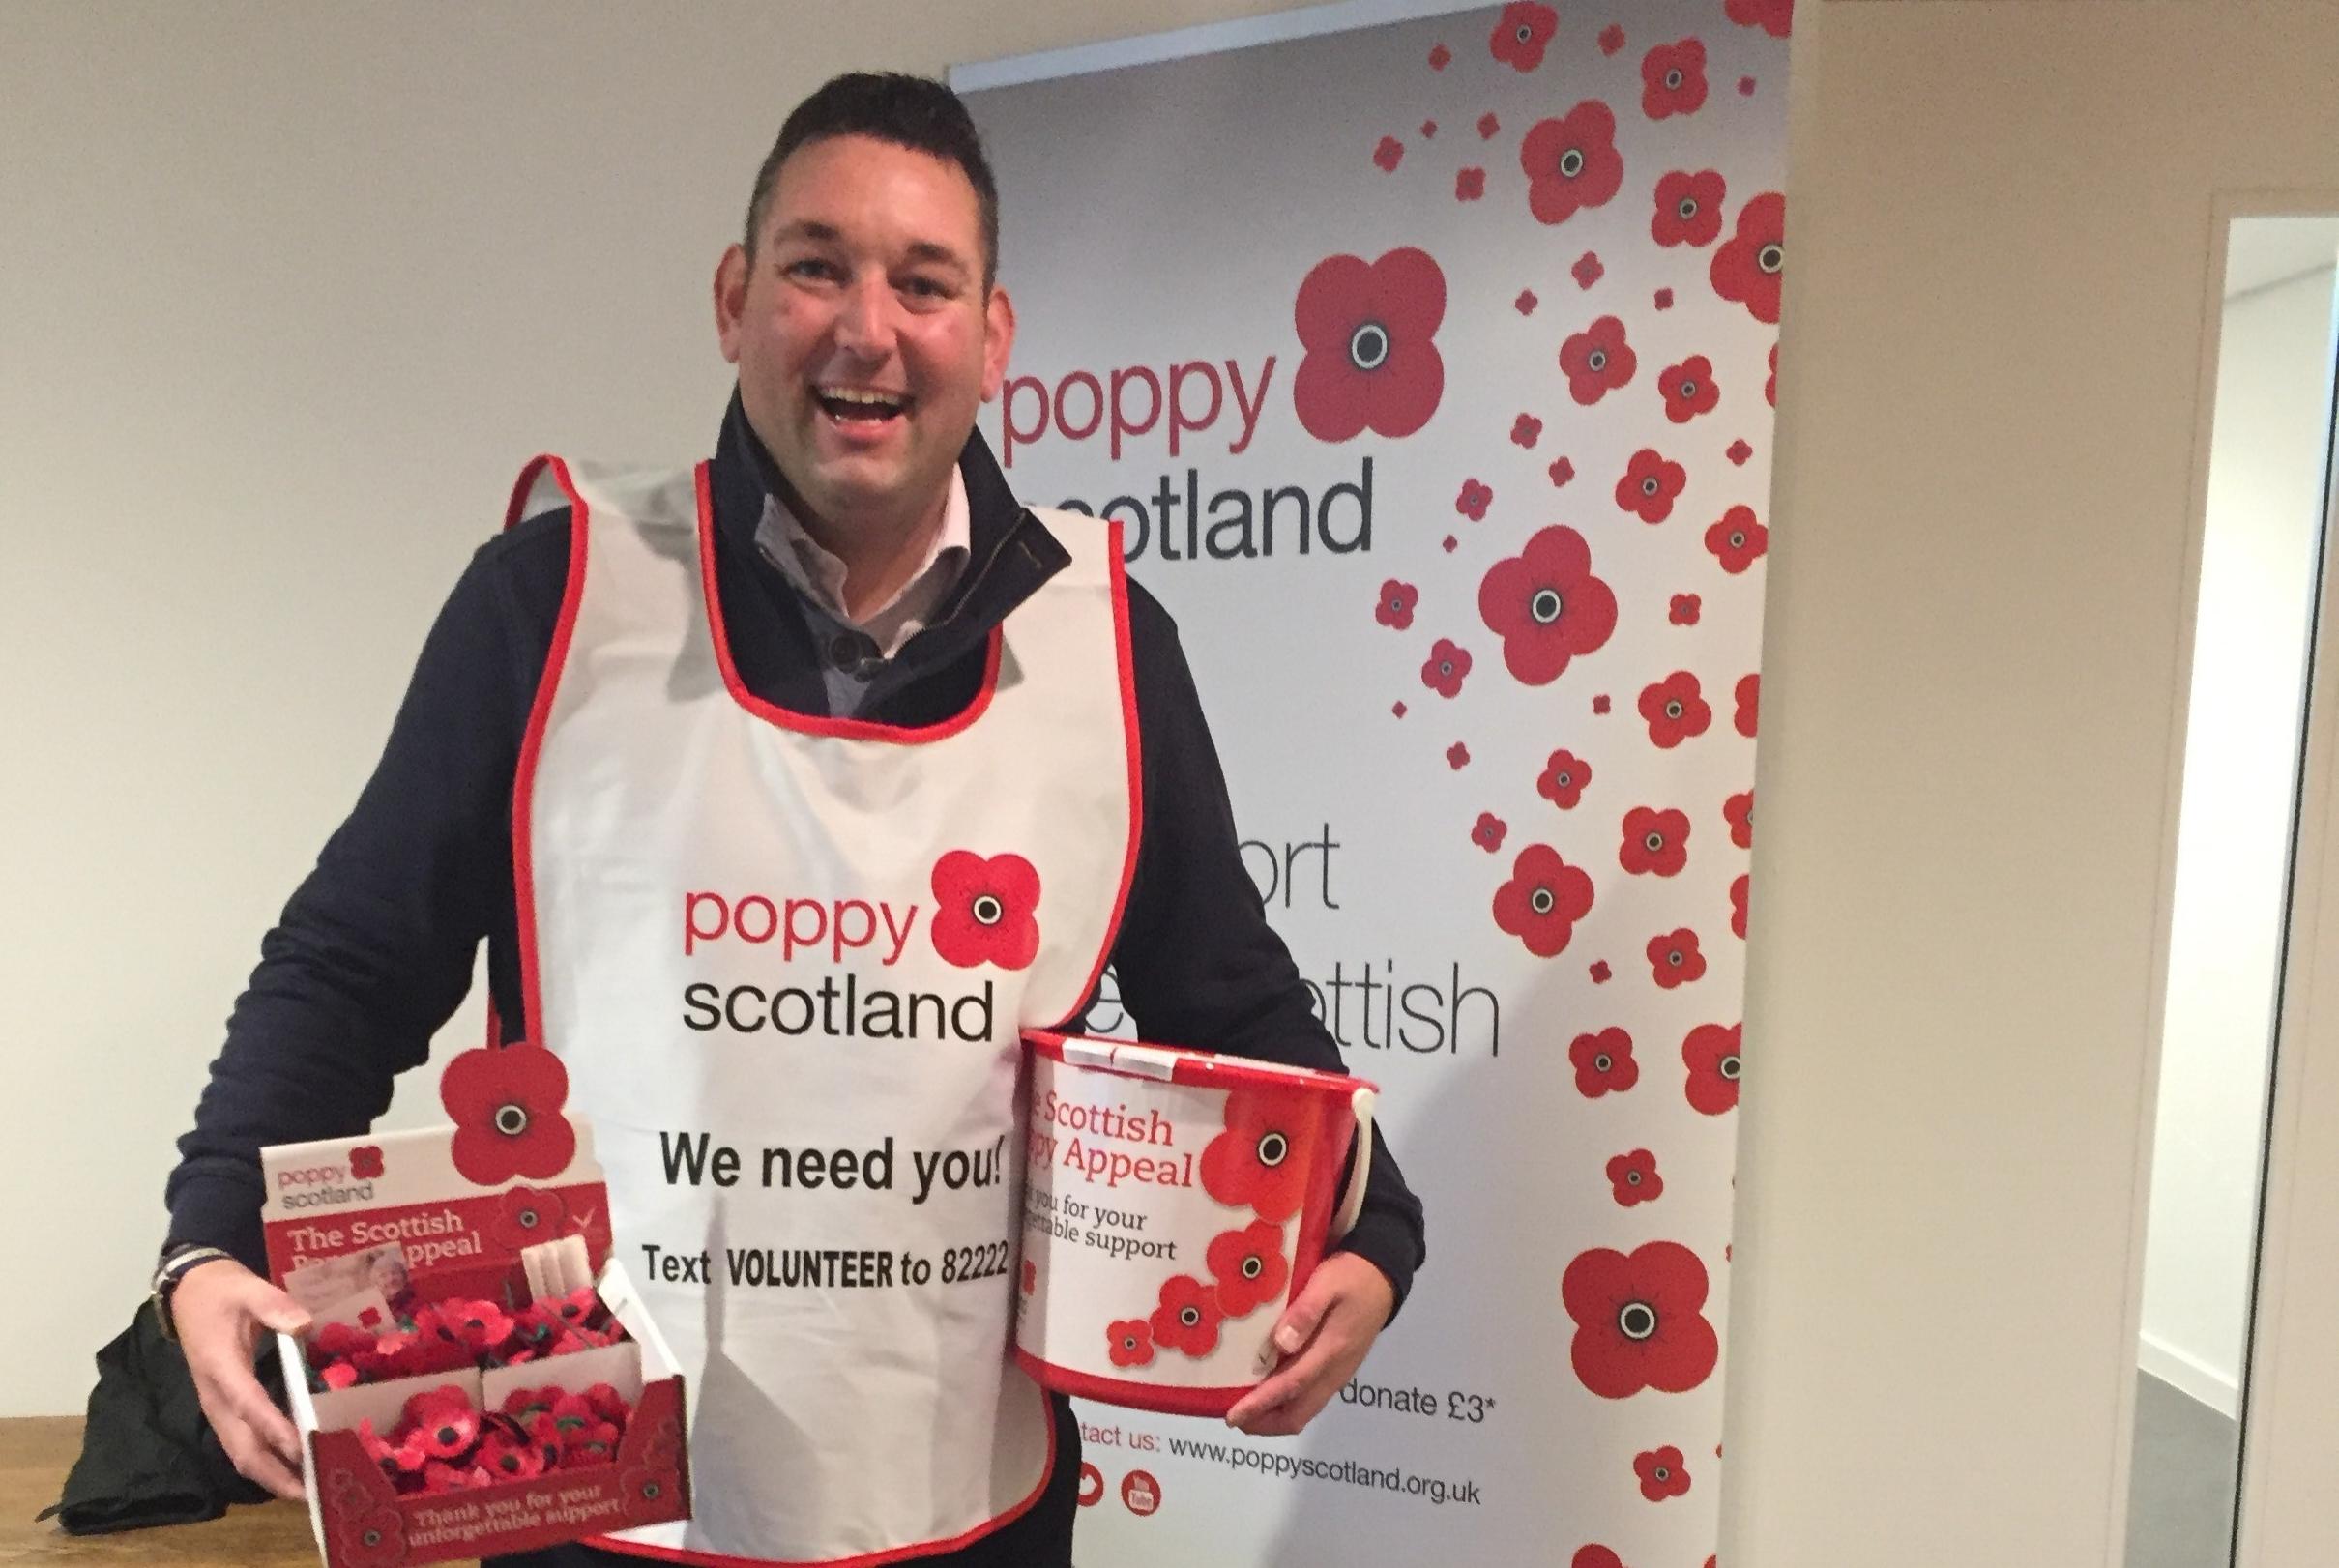 Miles collecting money for Poppy Scotland